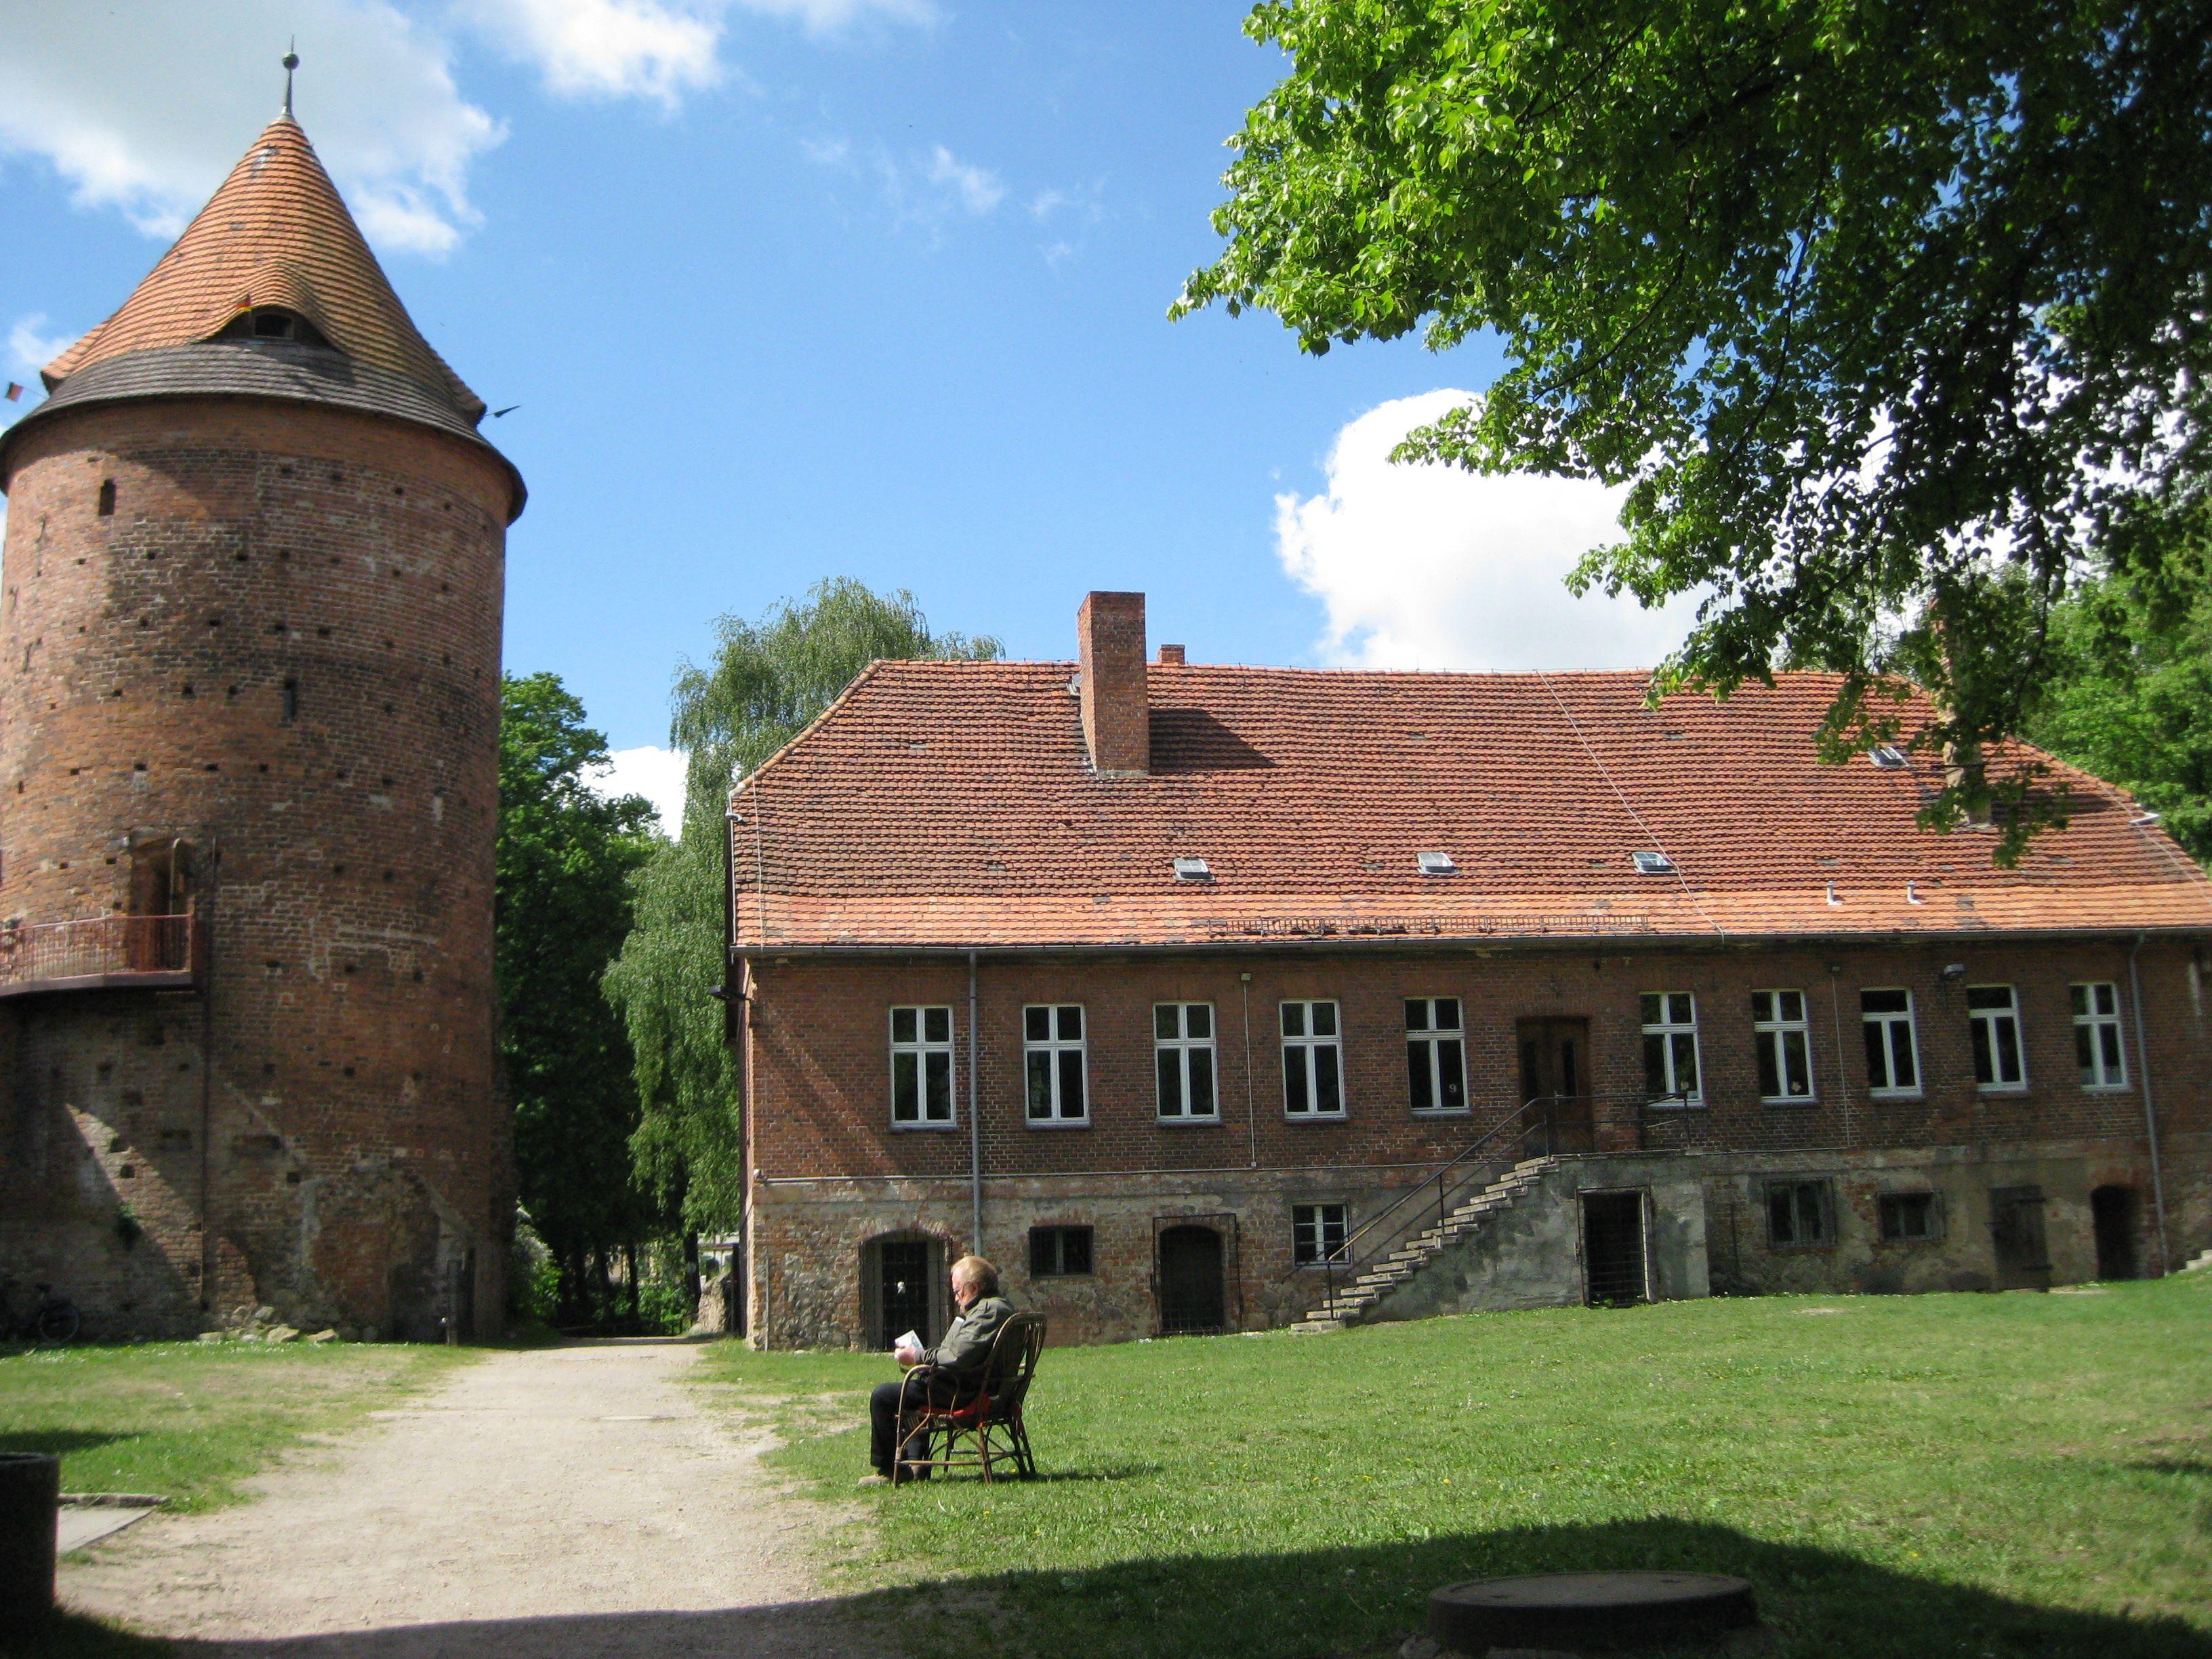 Plauer Burg Old Palace Castle In Plau Am See Germany Grosse Seen Radtouren Erkunden